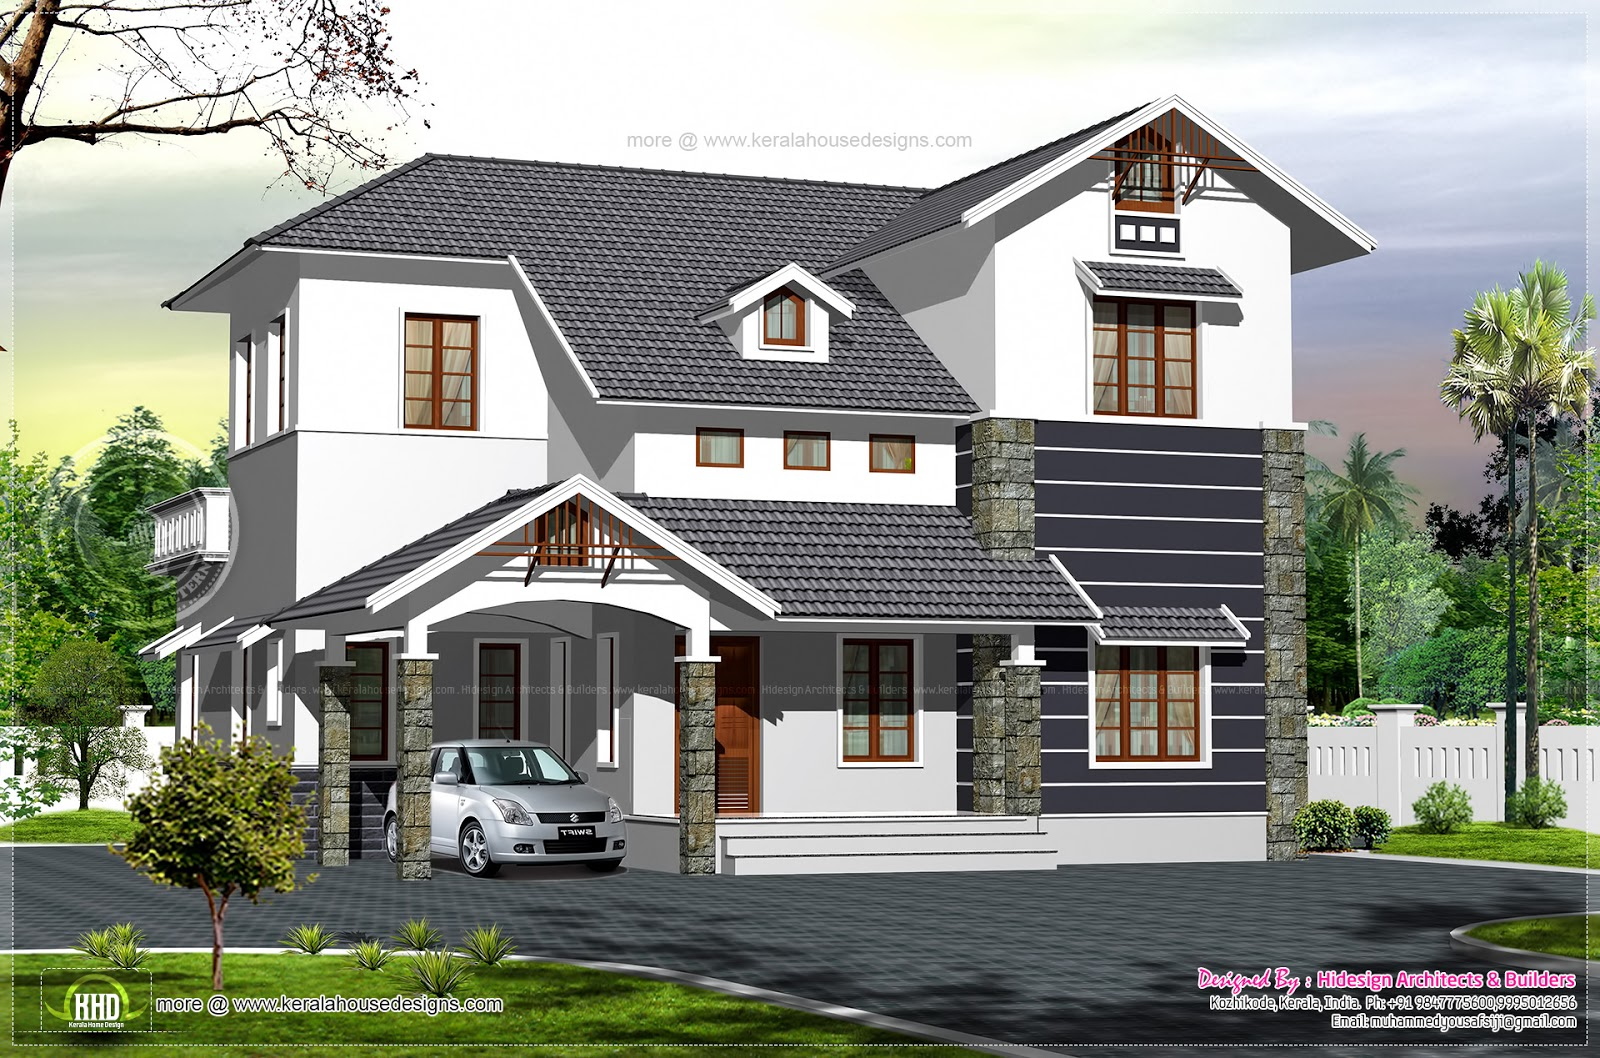 1720 Square Feet Villa Elevation House Design Plans